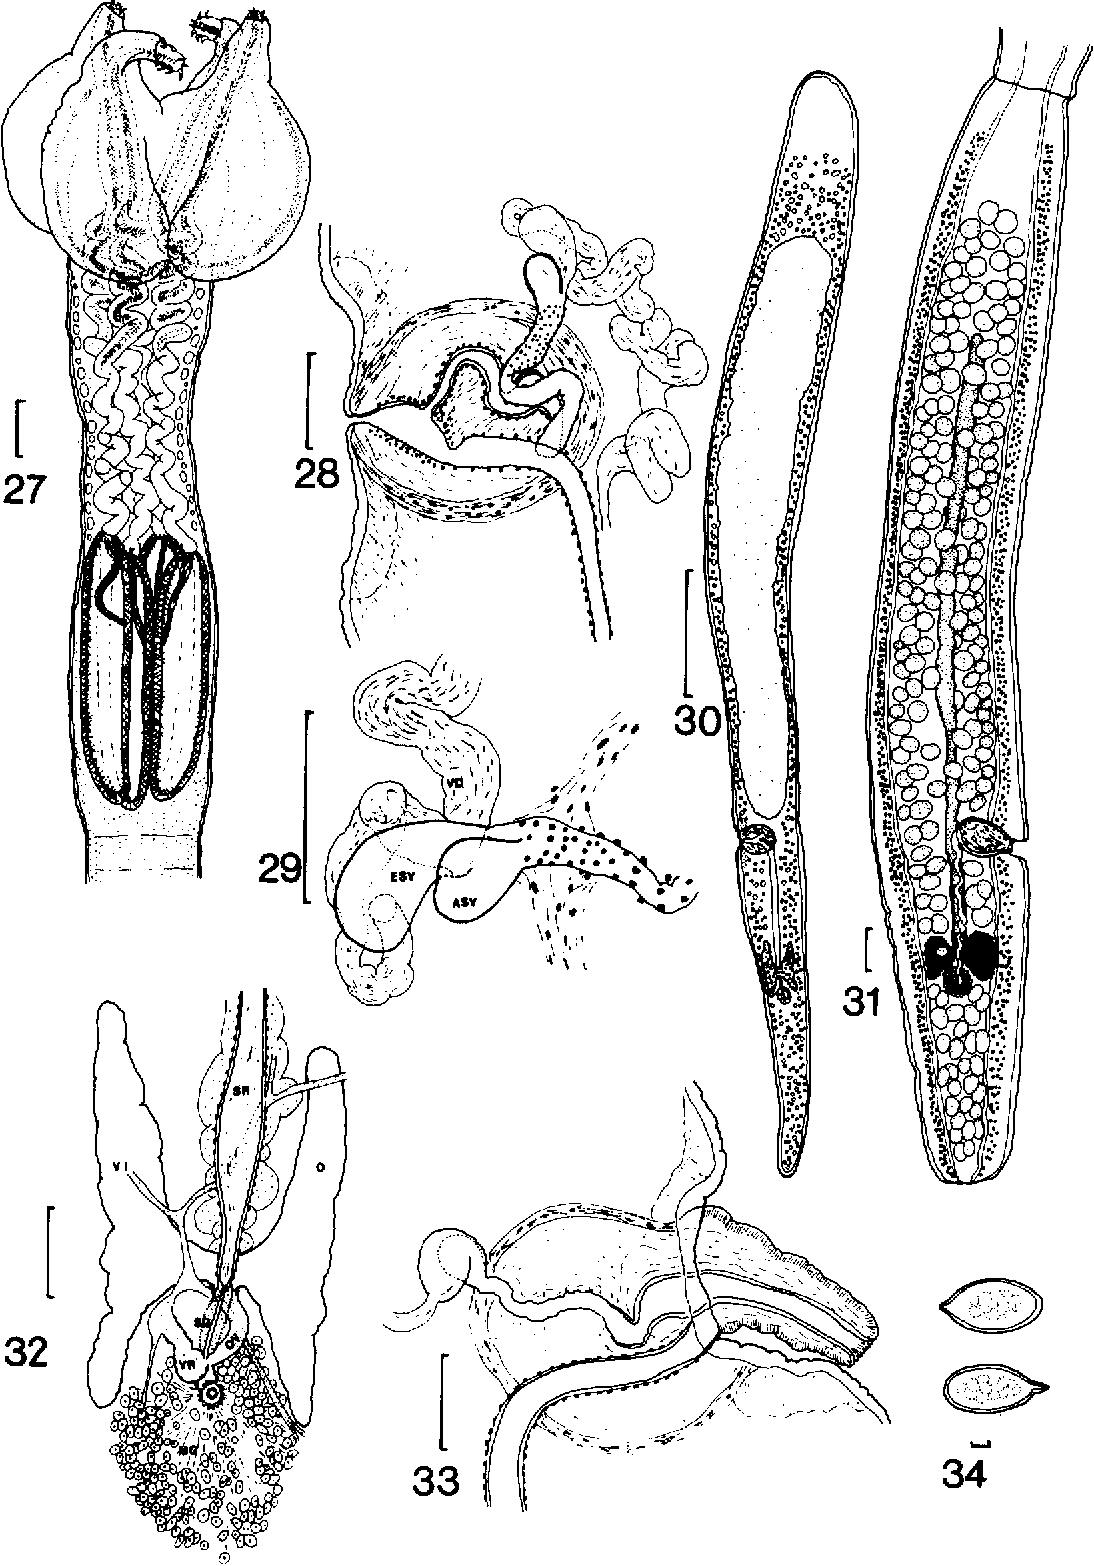 figure 27-34